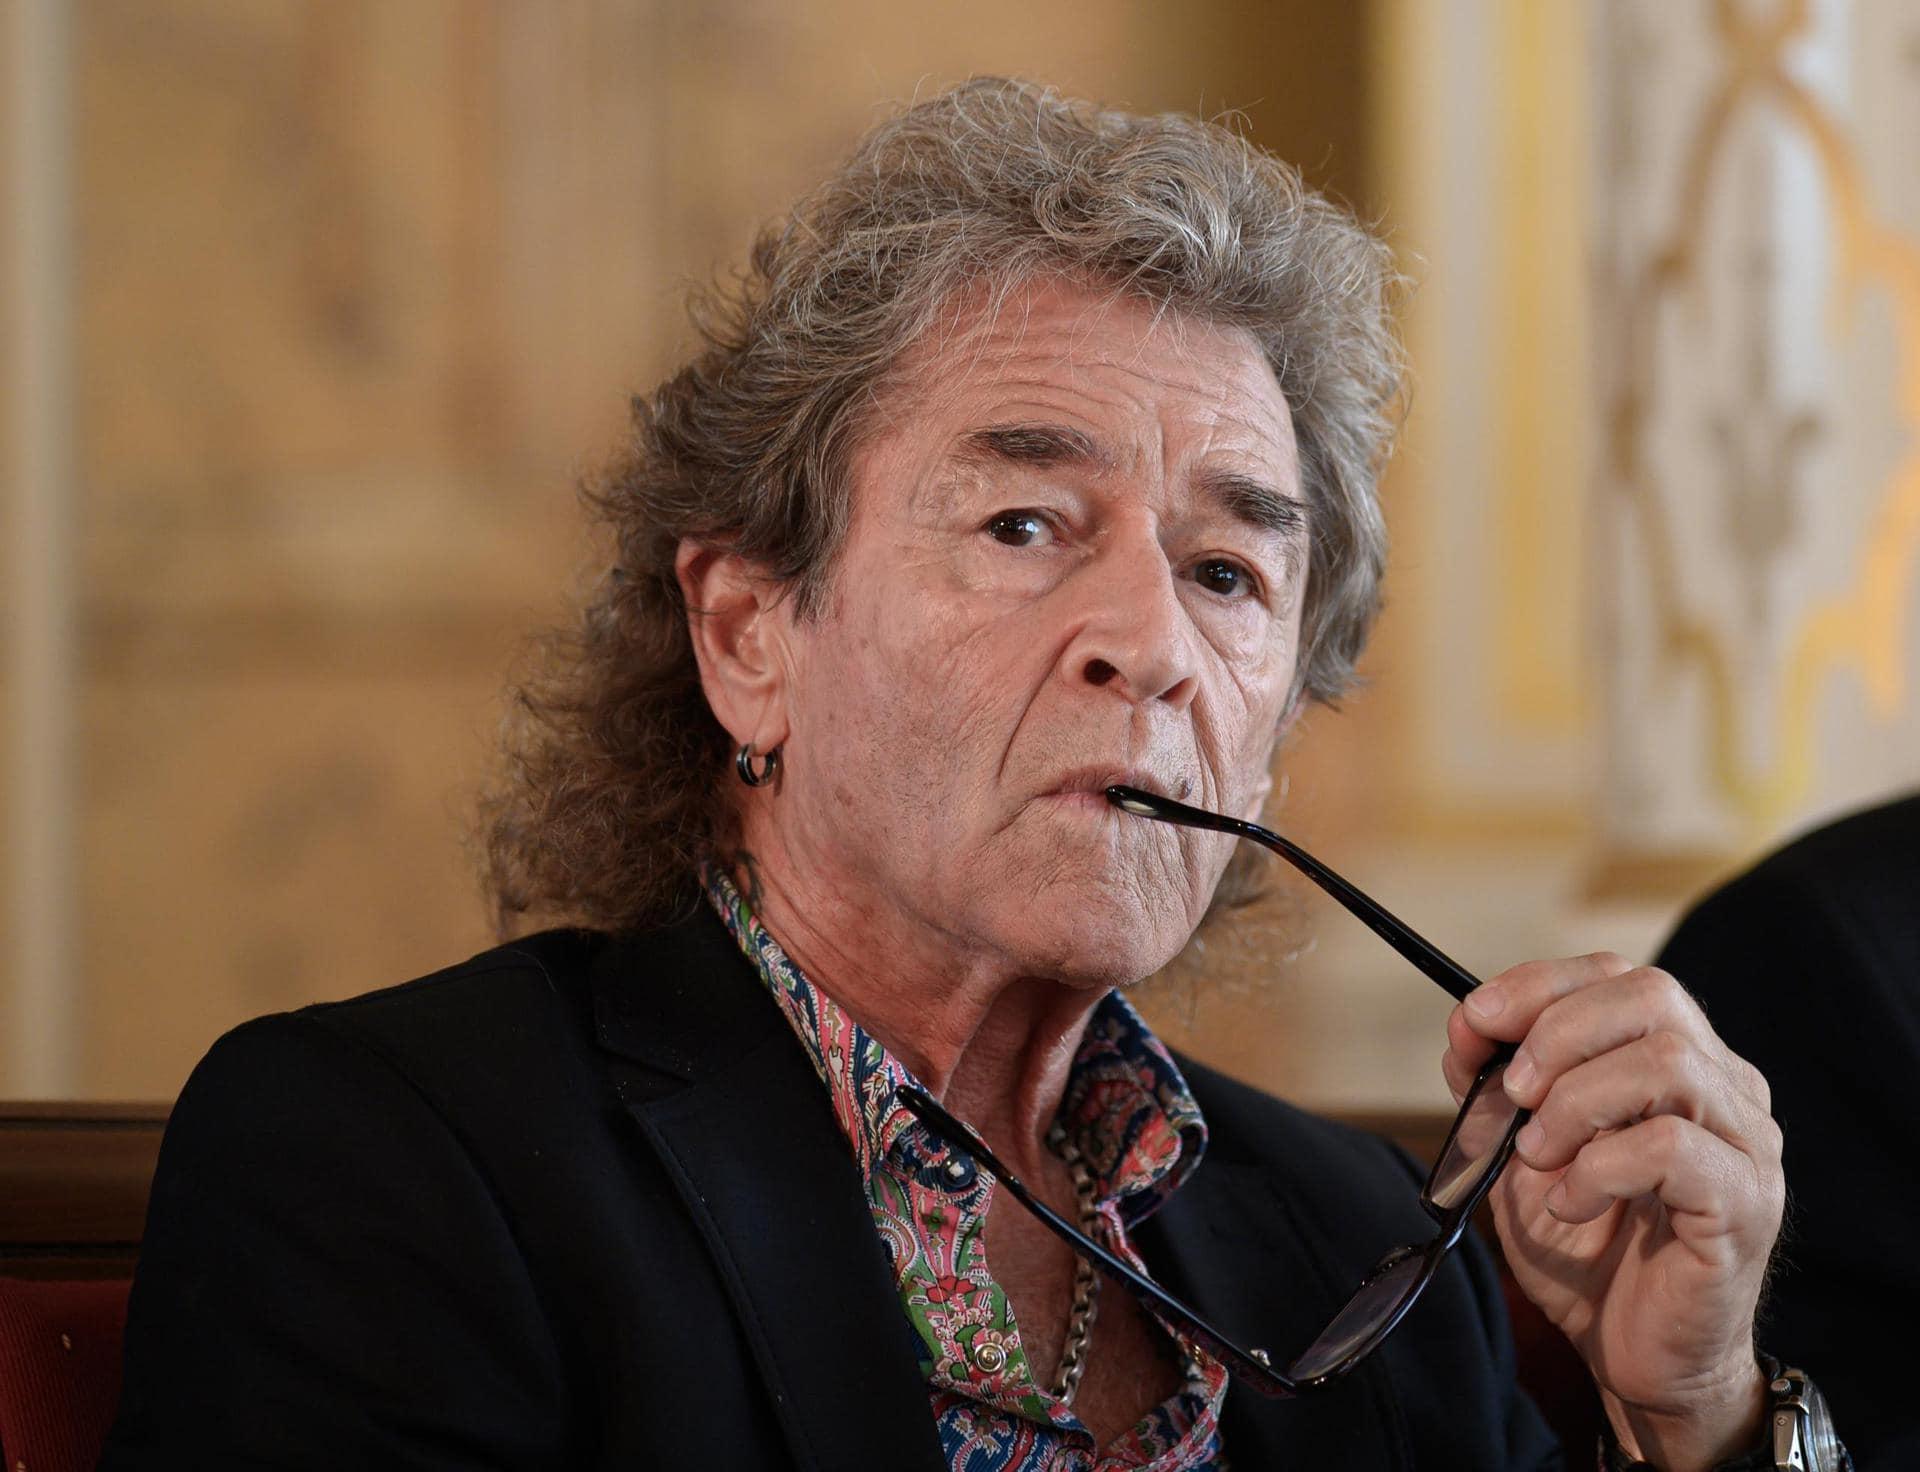 Peter Maffay: «Hier sind viele Existenzen bedroht» Kulturbranche